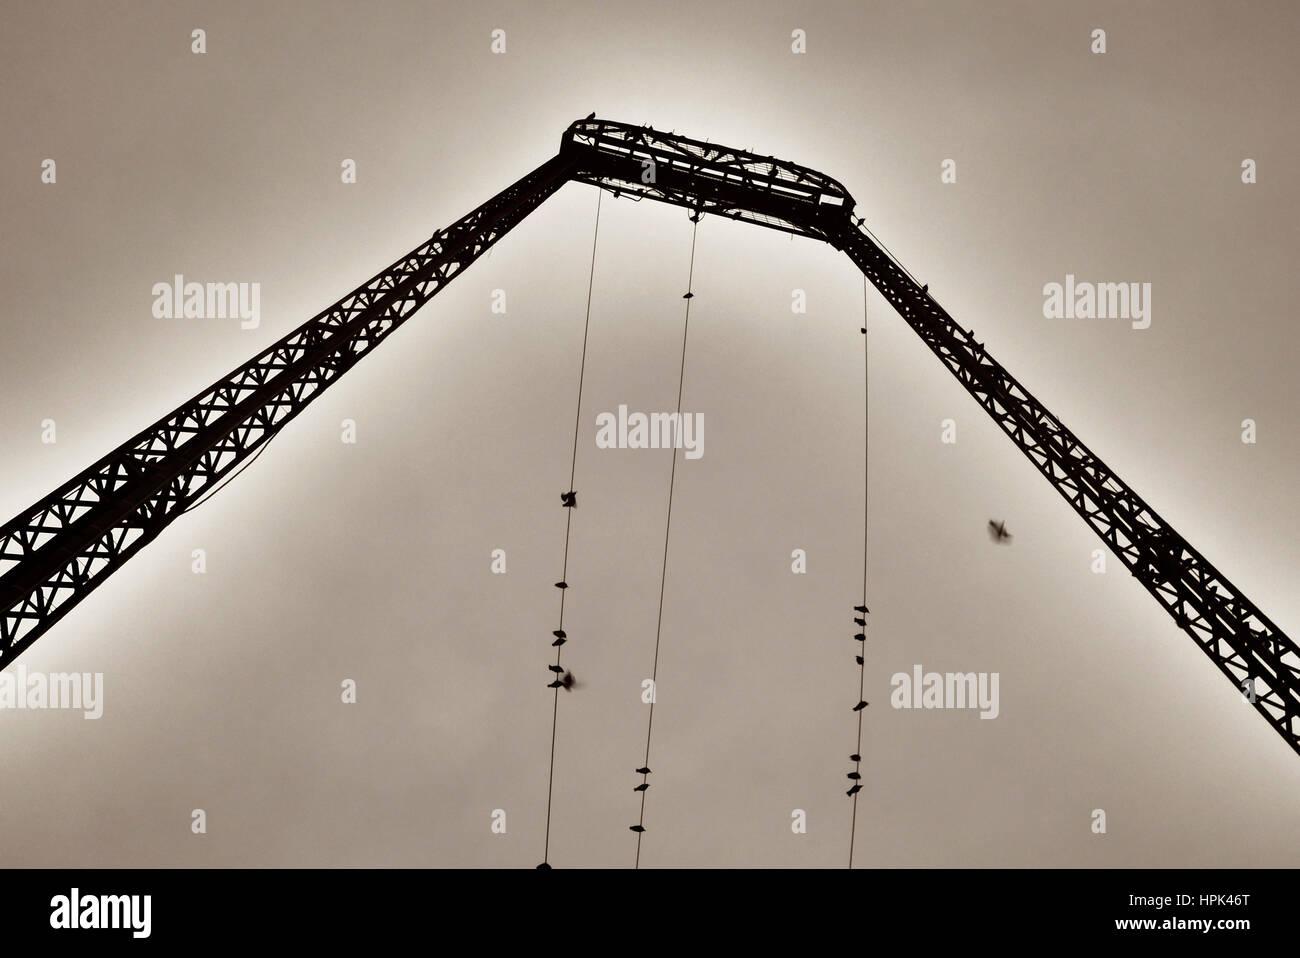 Haunting immagini & haunting fotos stock alamy